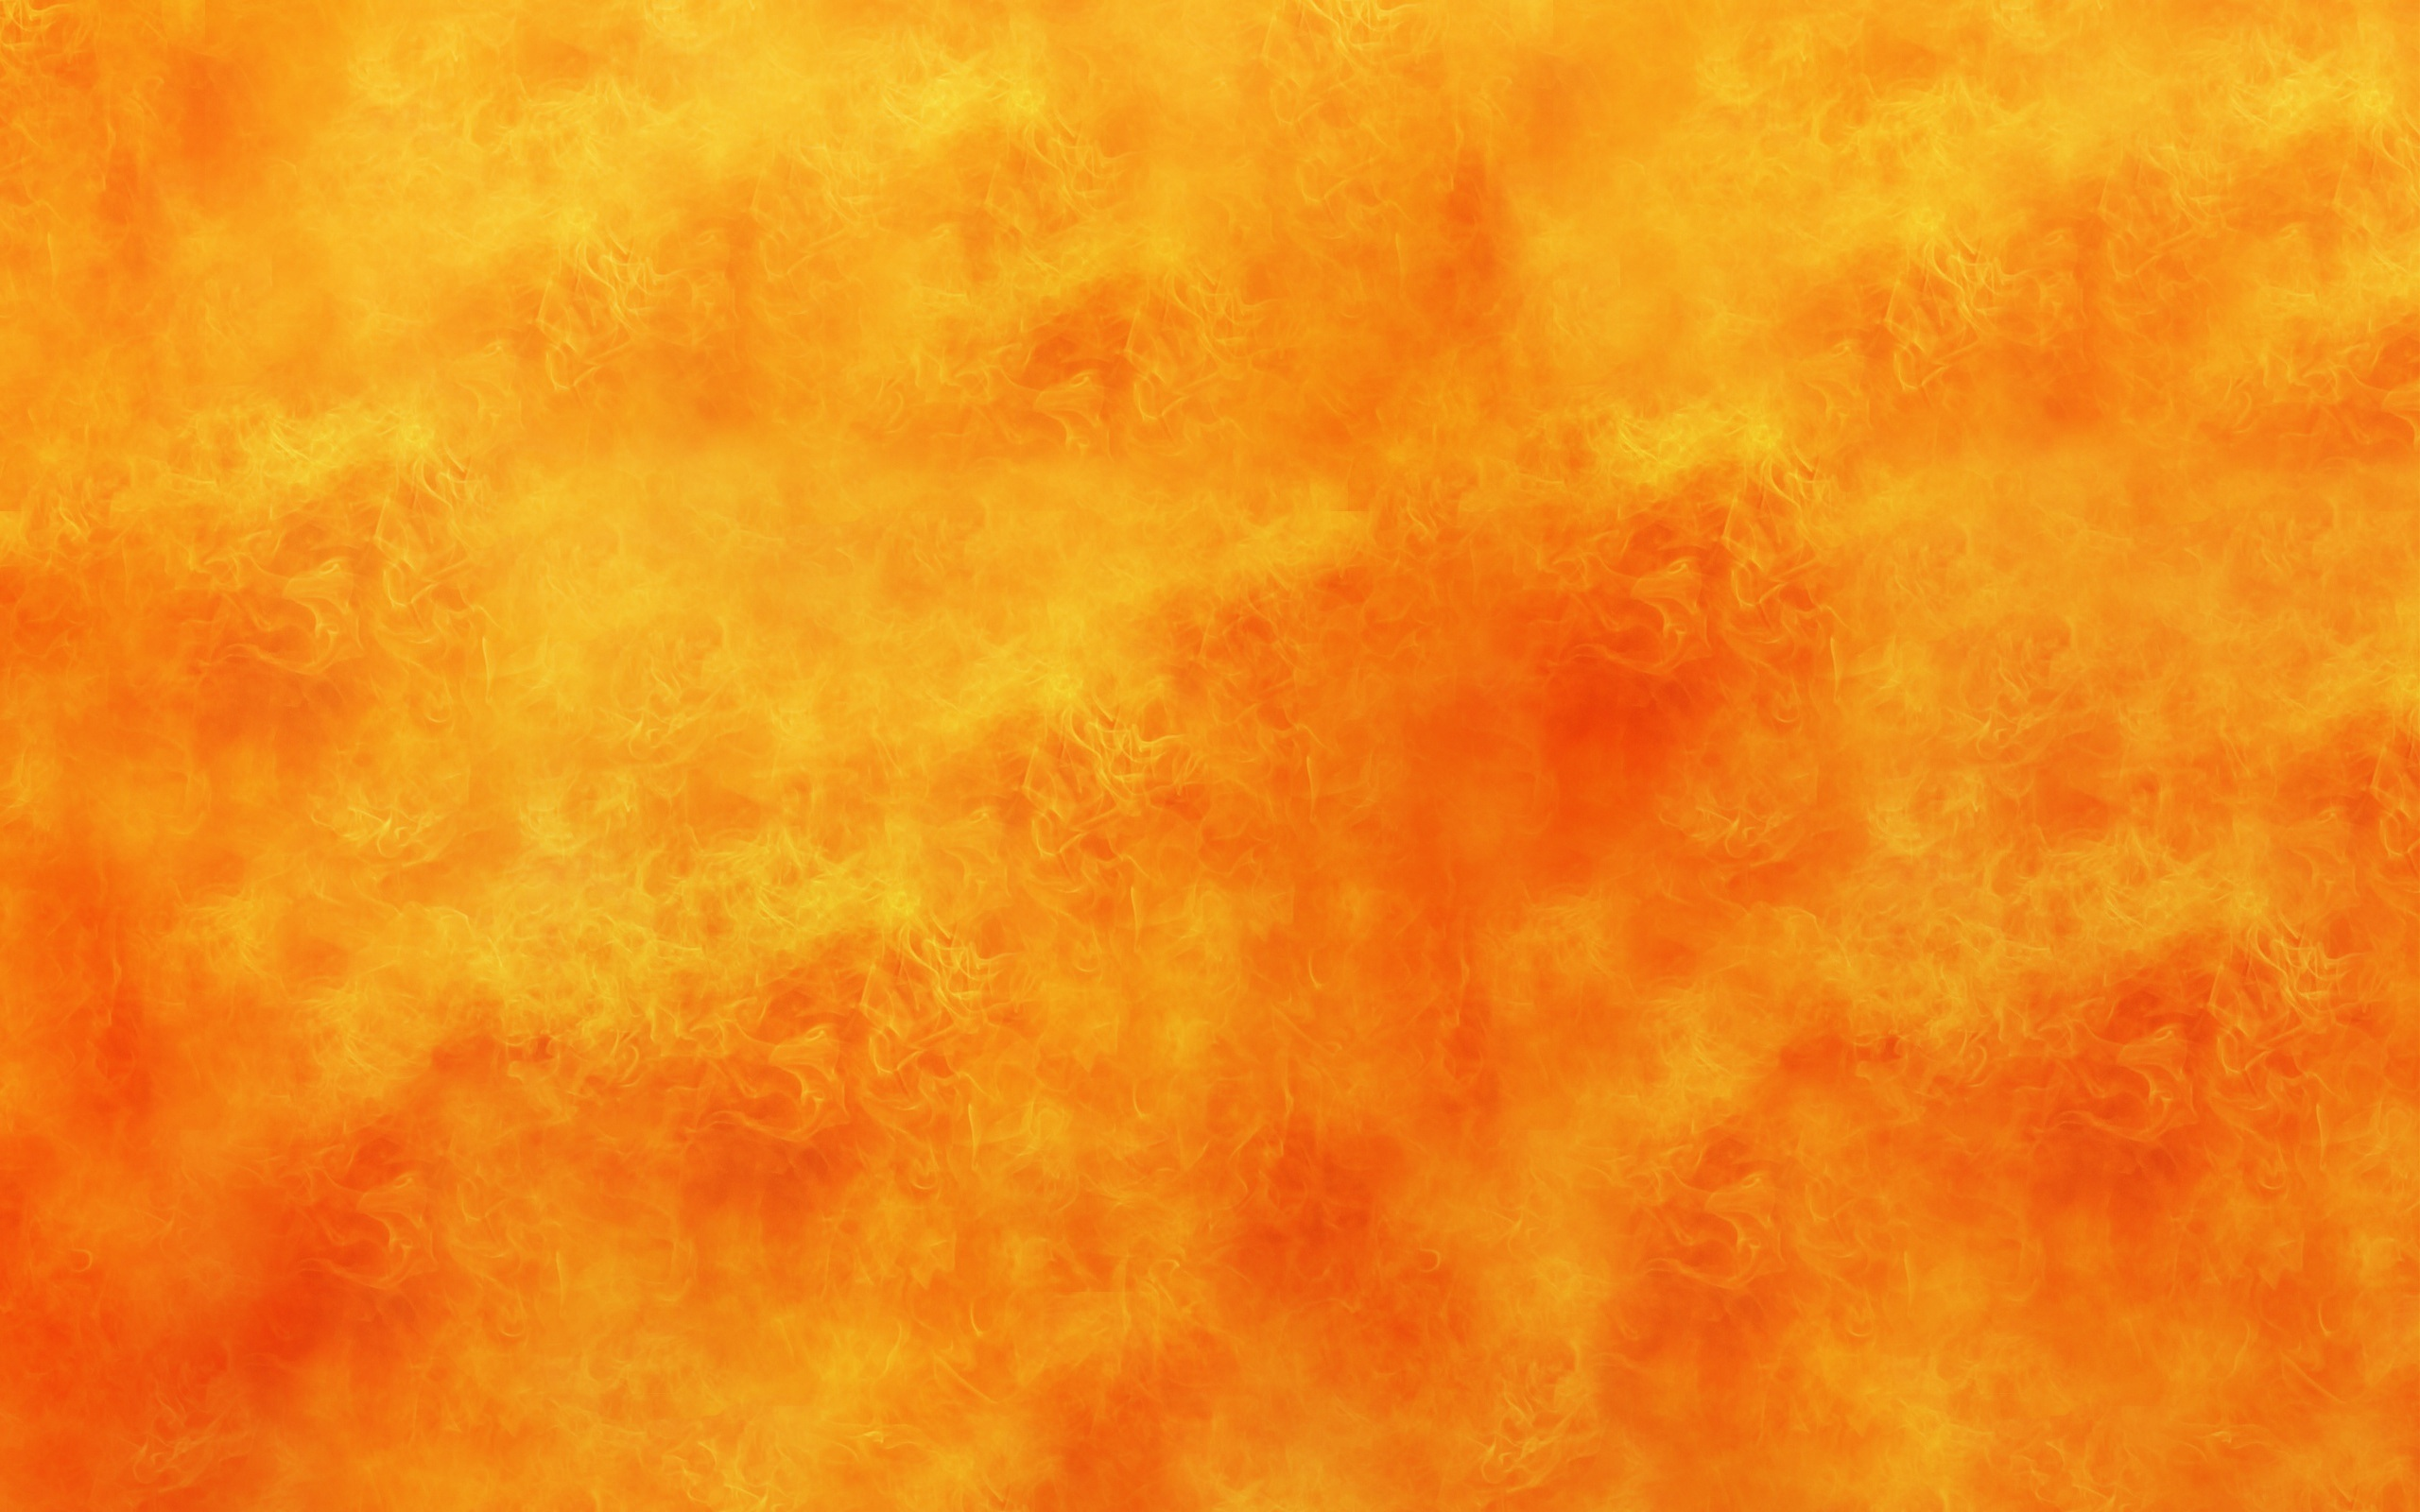 Iphone Hd Wallpaper: Orange HD Wallpaper